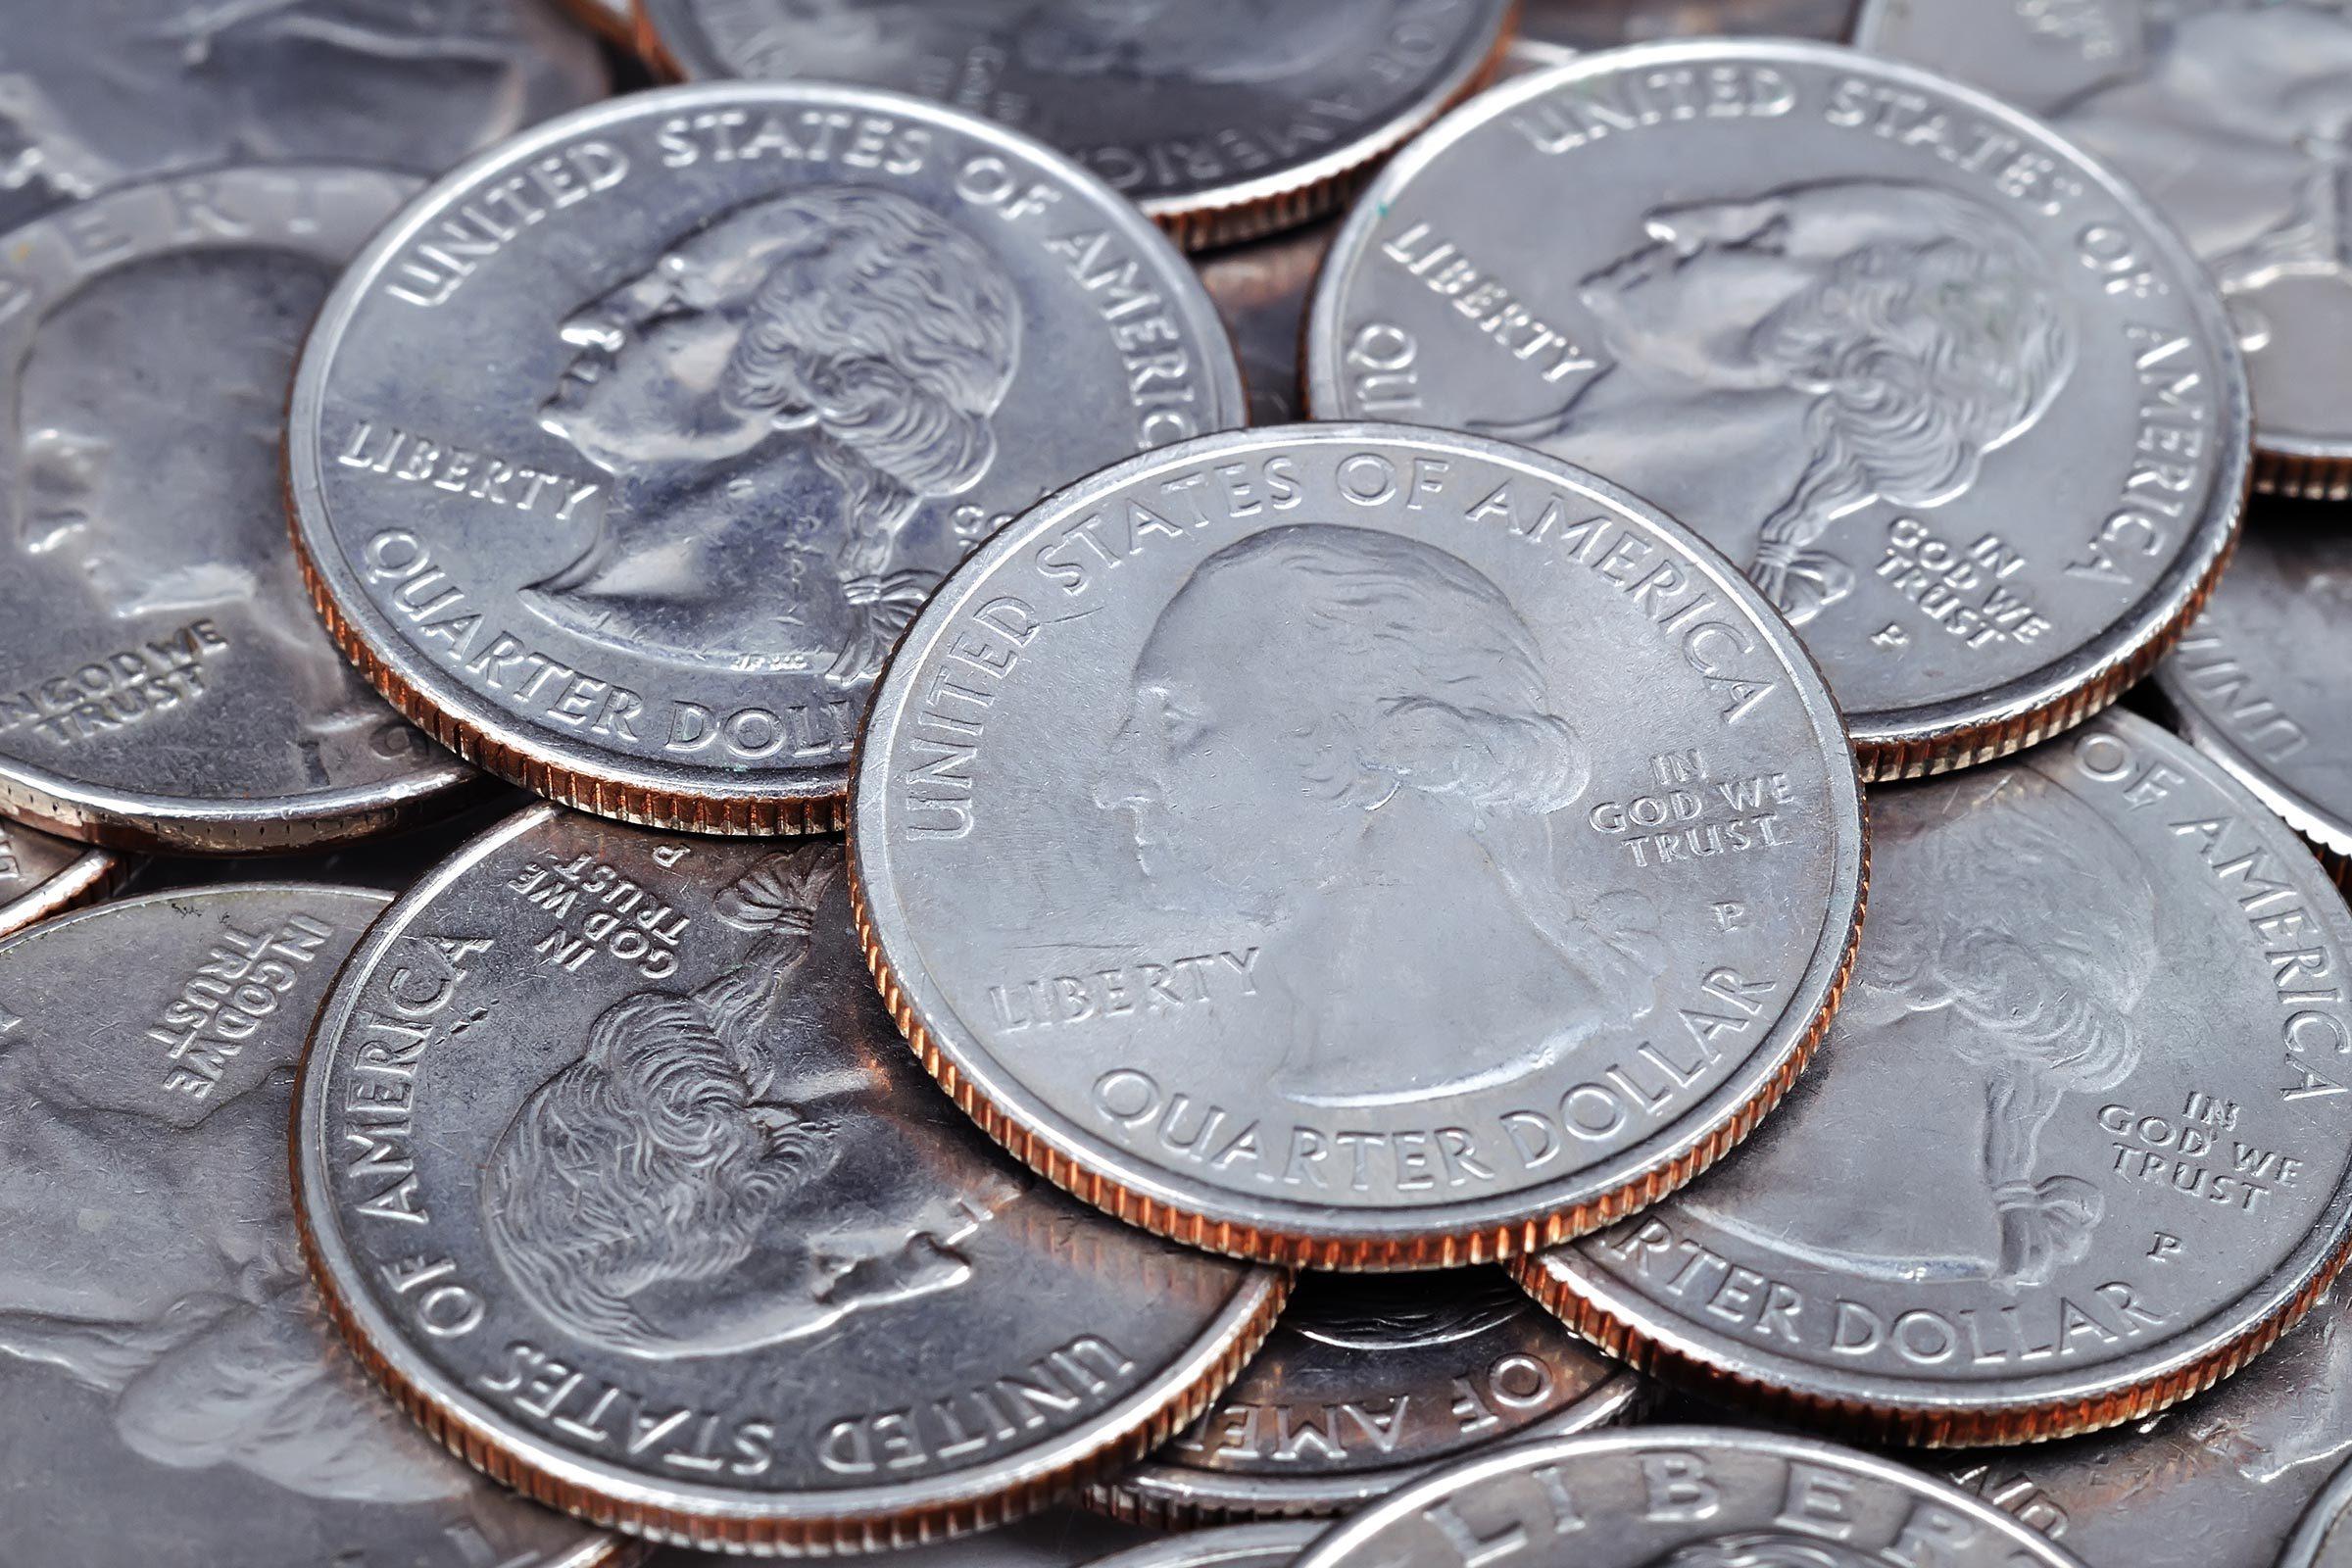 us quarters coins close up macro